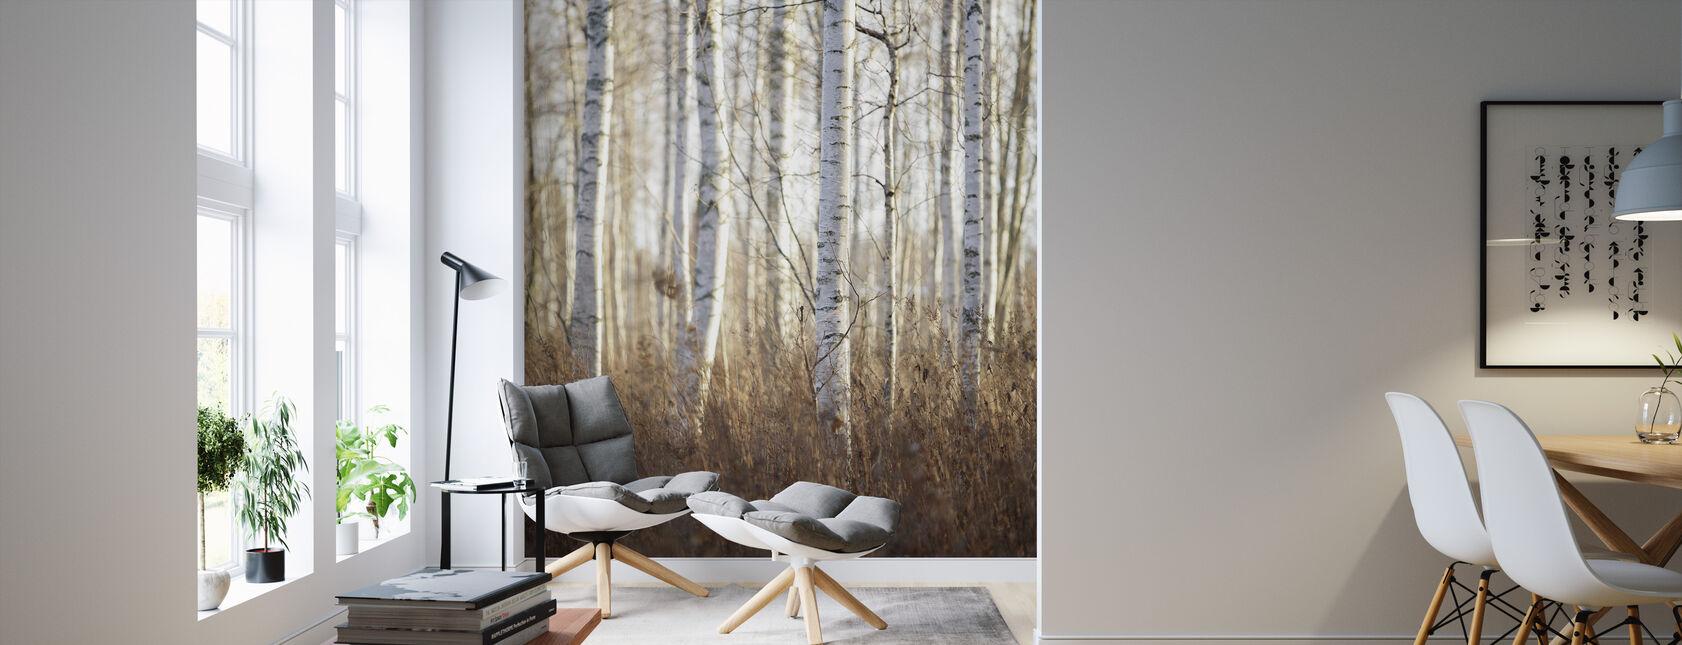 Birch Forest in Dalarna, Sweden, Europe - Wallpaper - Living Room